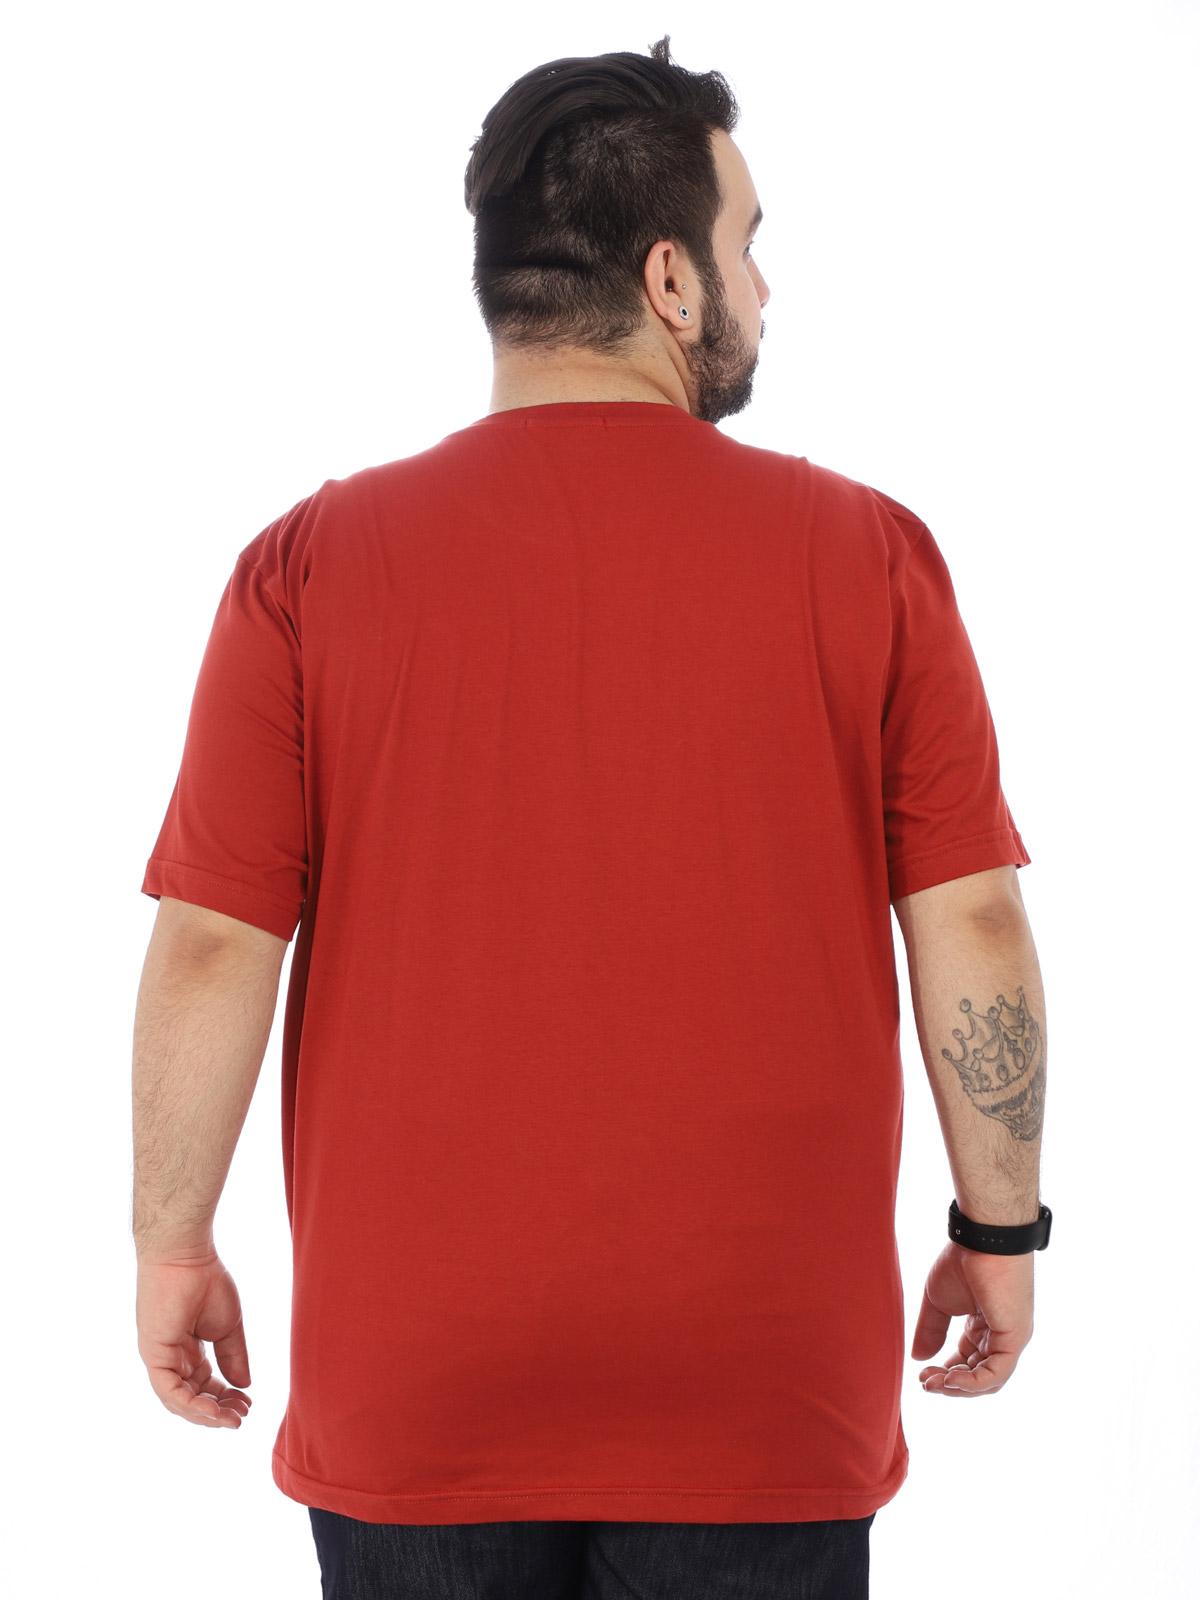 Camiseta Plus Size Lisa Masculino Básica Algodão Ferrugem